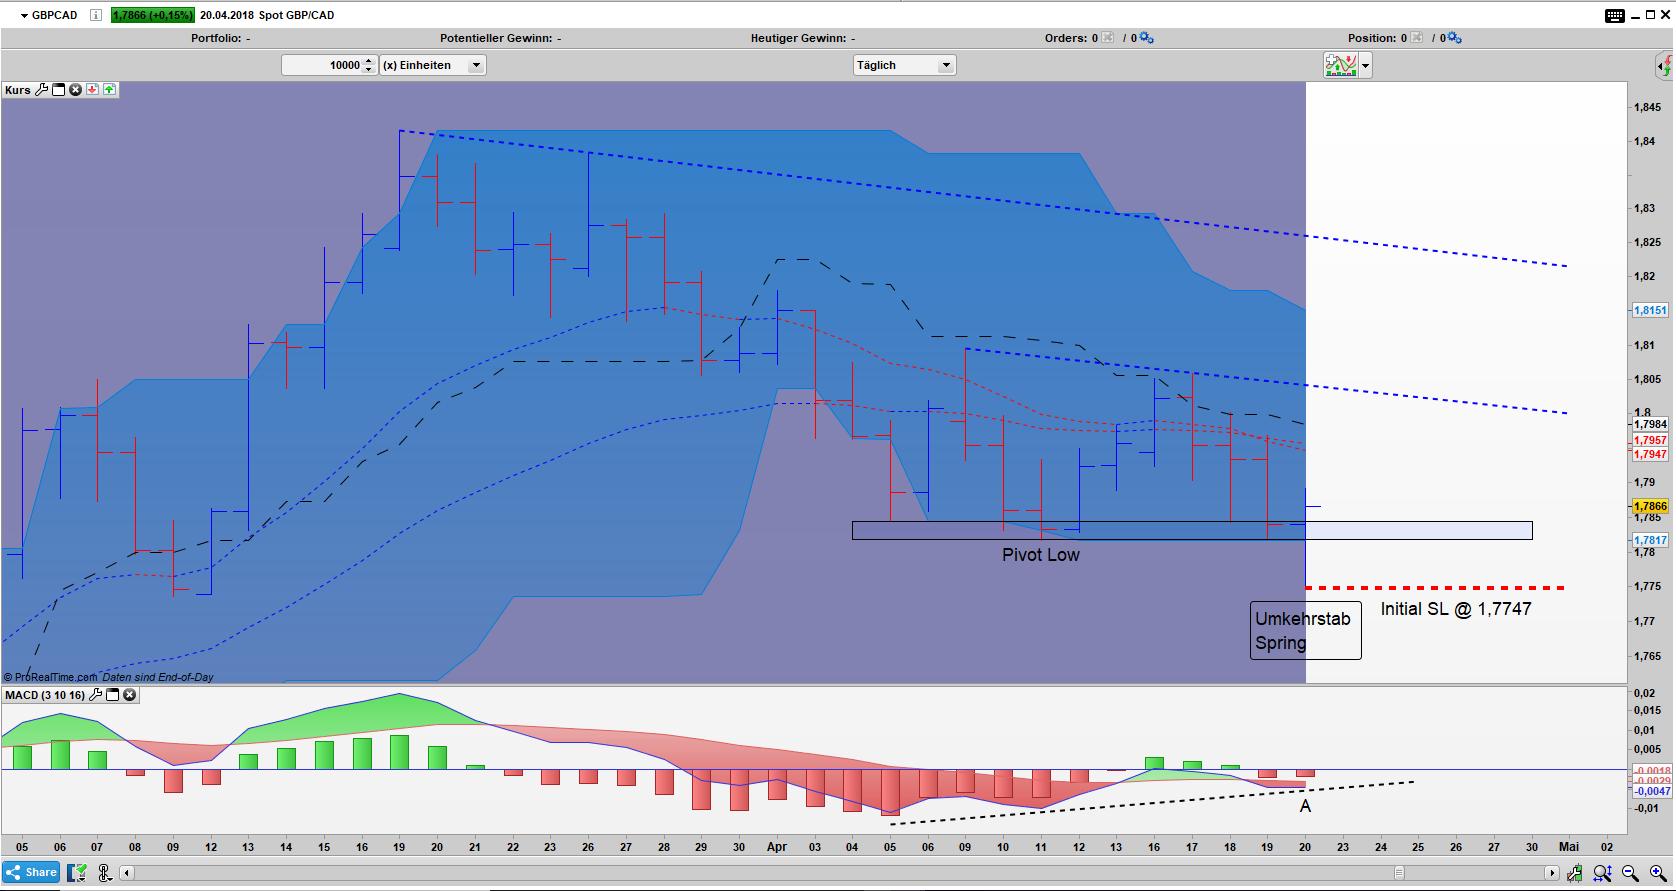 GBP/CAD Bar Tages Chart: Umkehrstab Spring Pattern geformt, gute Chance auf drei Tage up